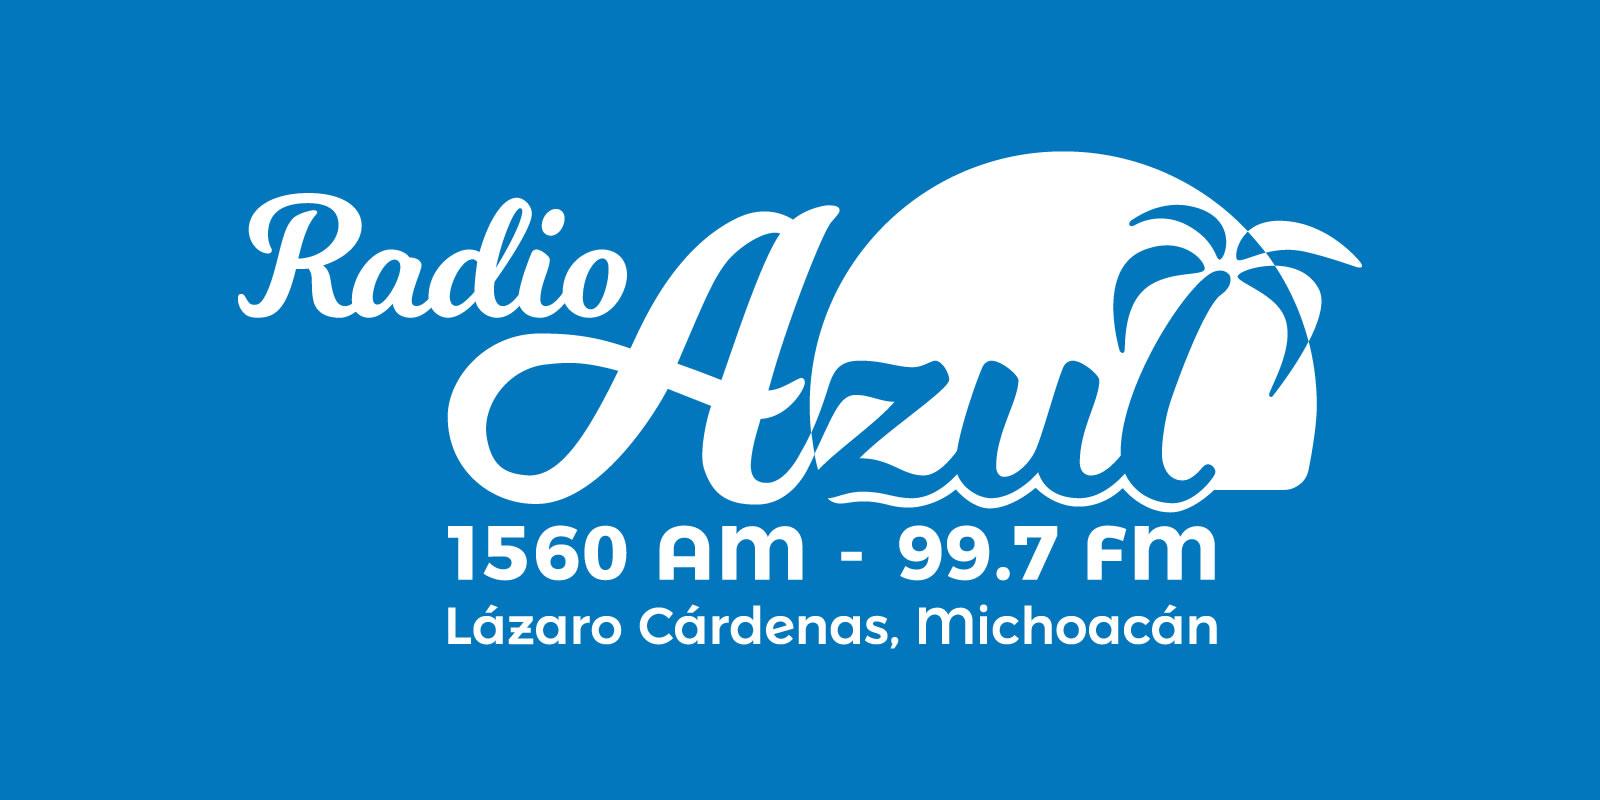 Radio Azul, 1560 AM, Lazaro Cardenas, Michoacan